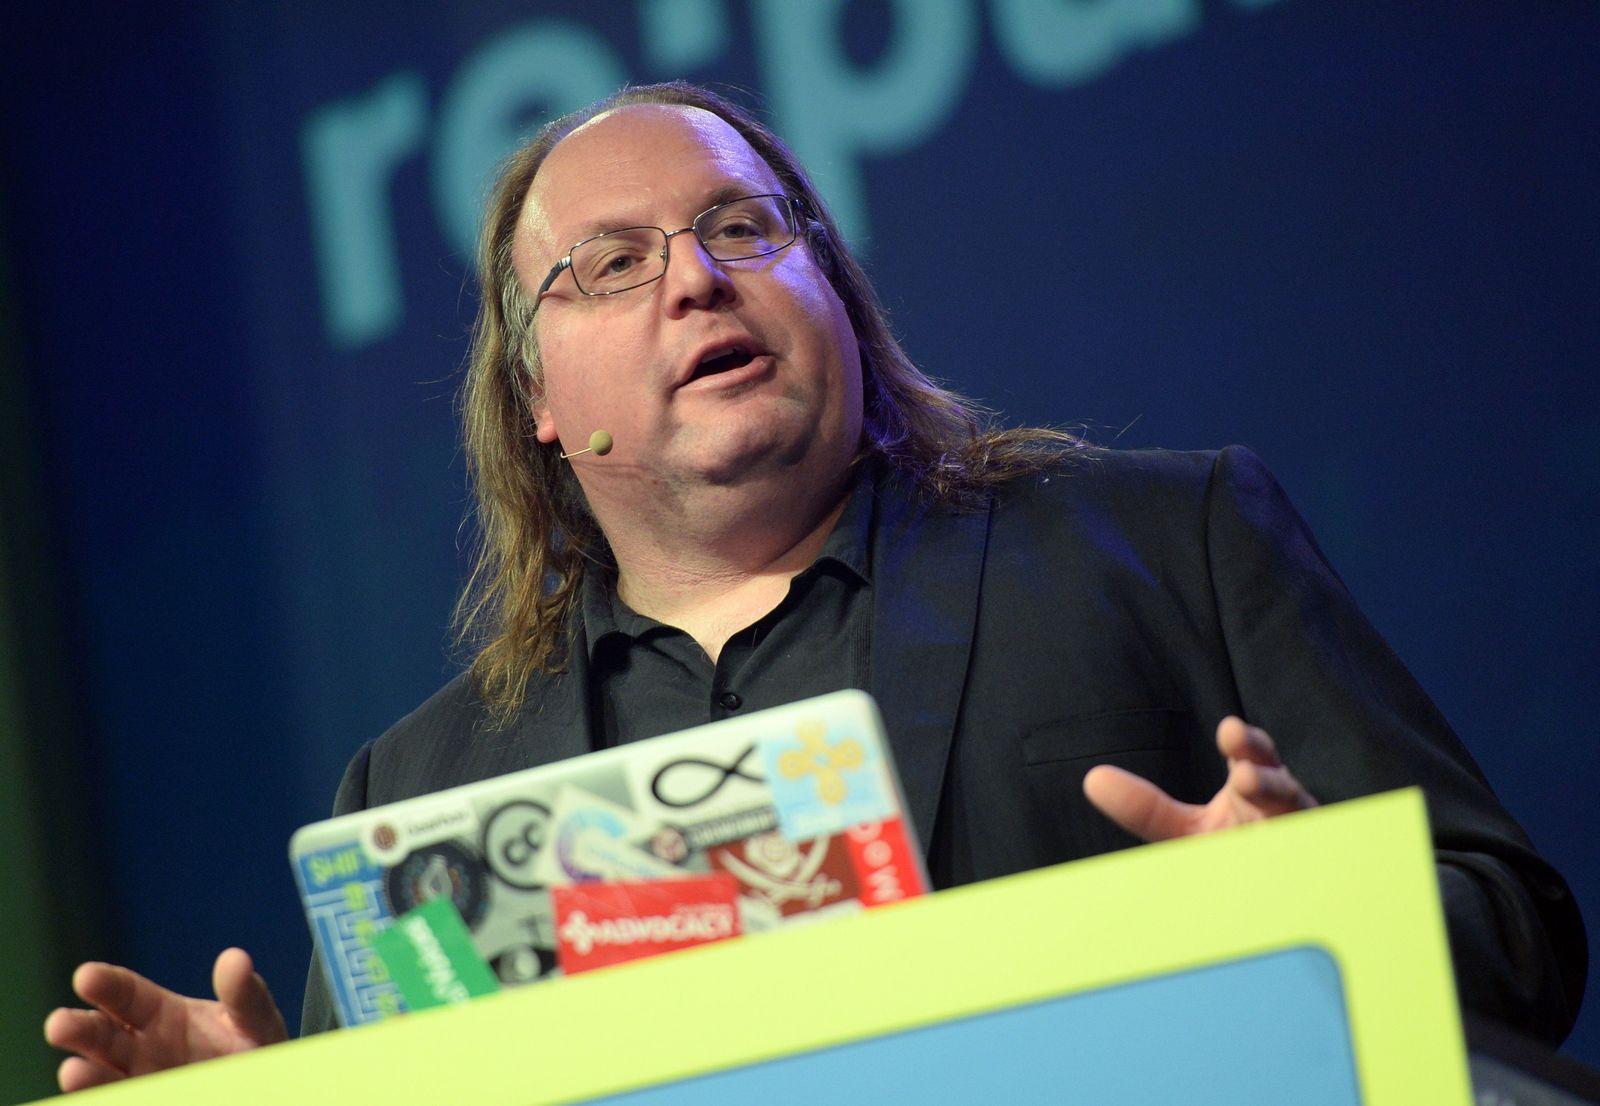 Re:publica 2015/ Ethan Zuckerman